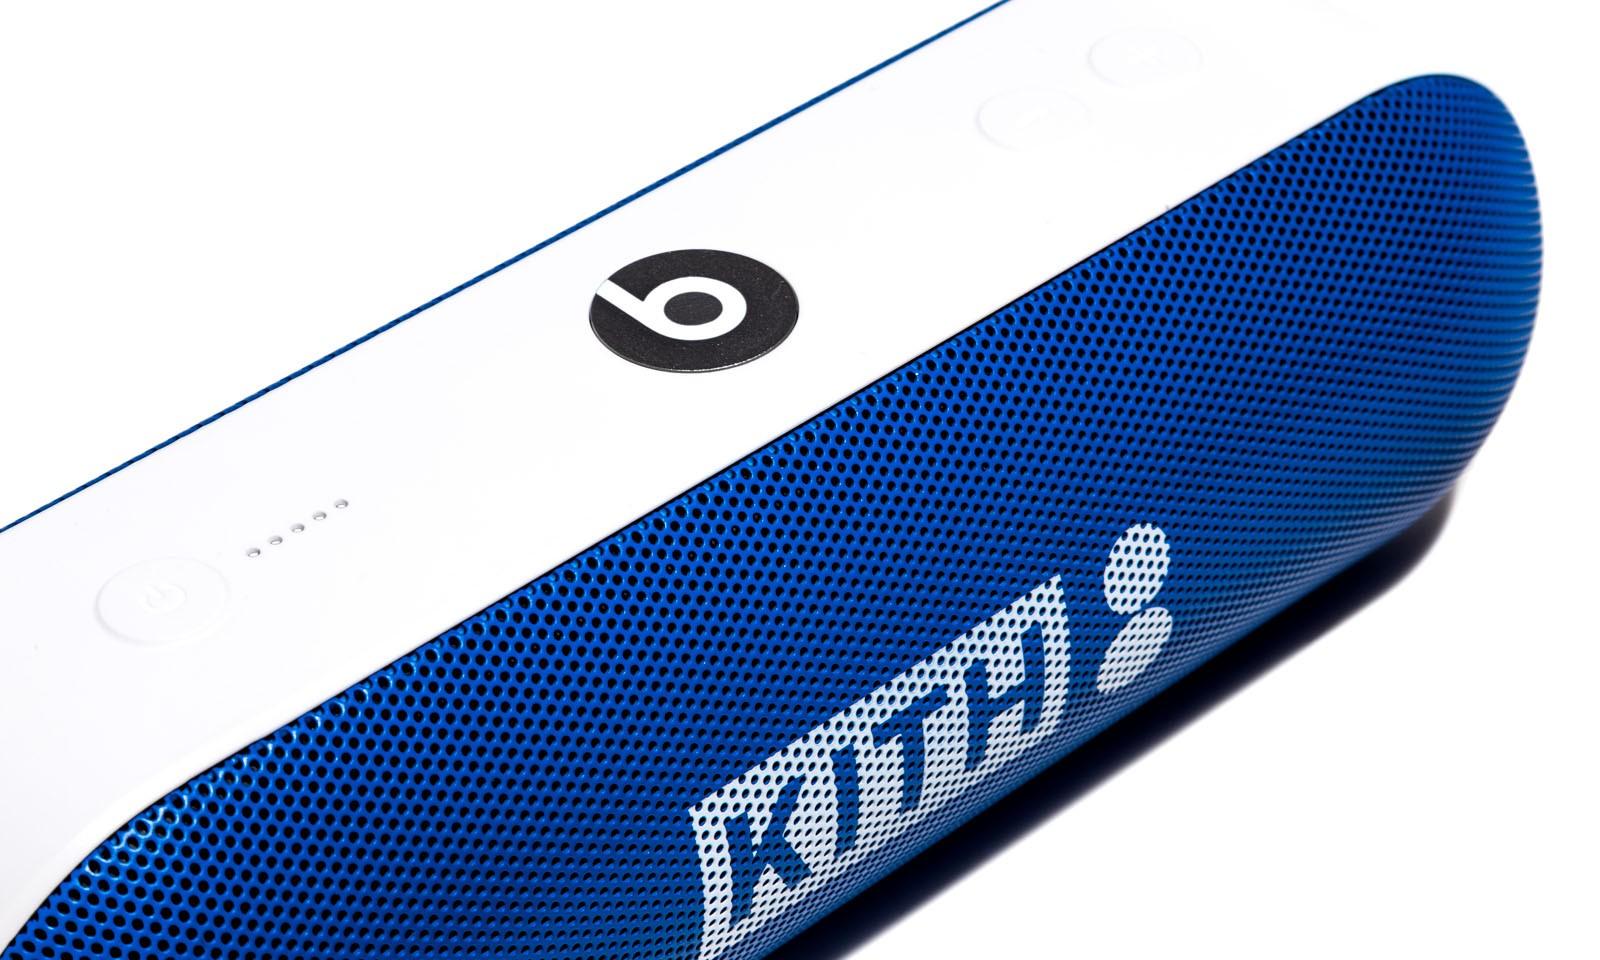 Beats by Dr. Dre x KITH x colette 限量合作系列发售